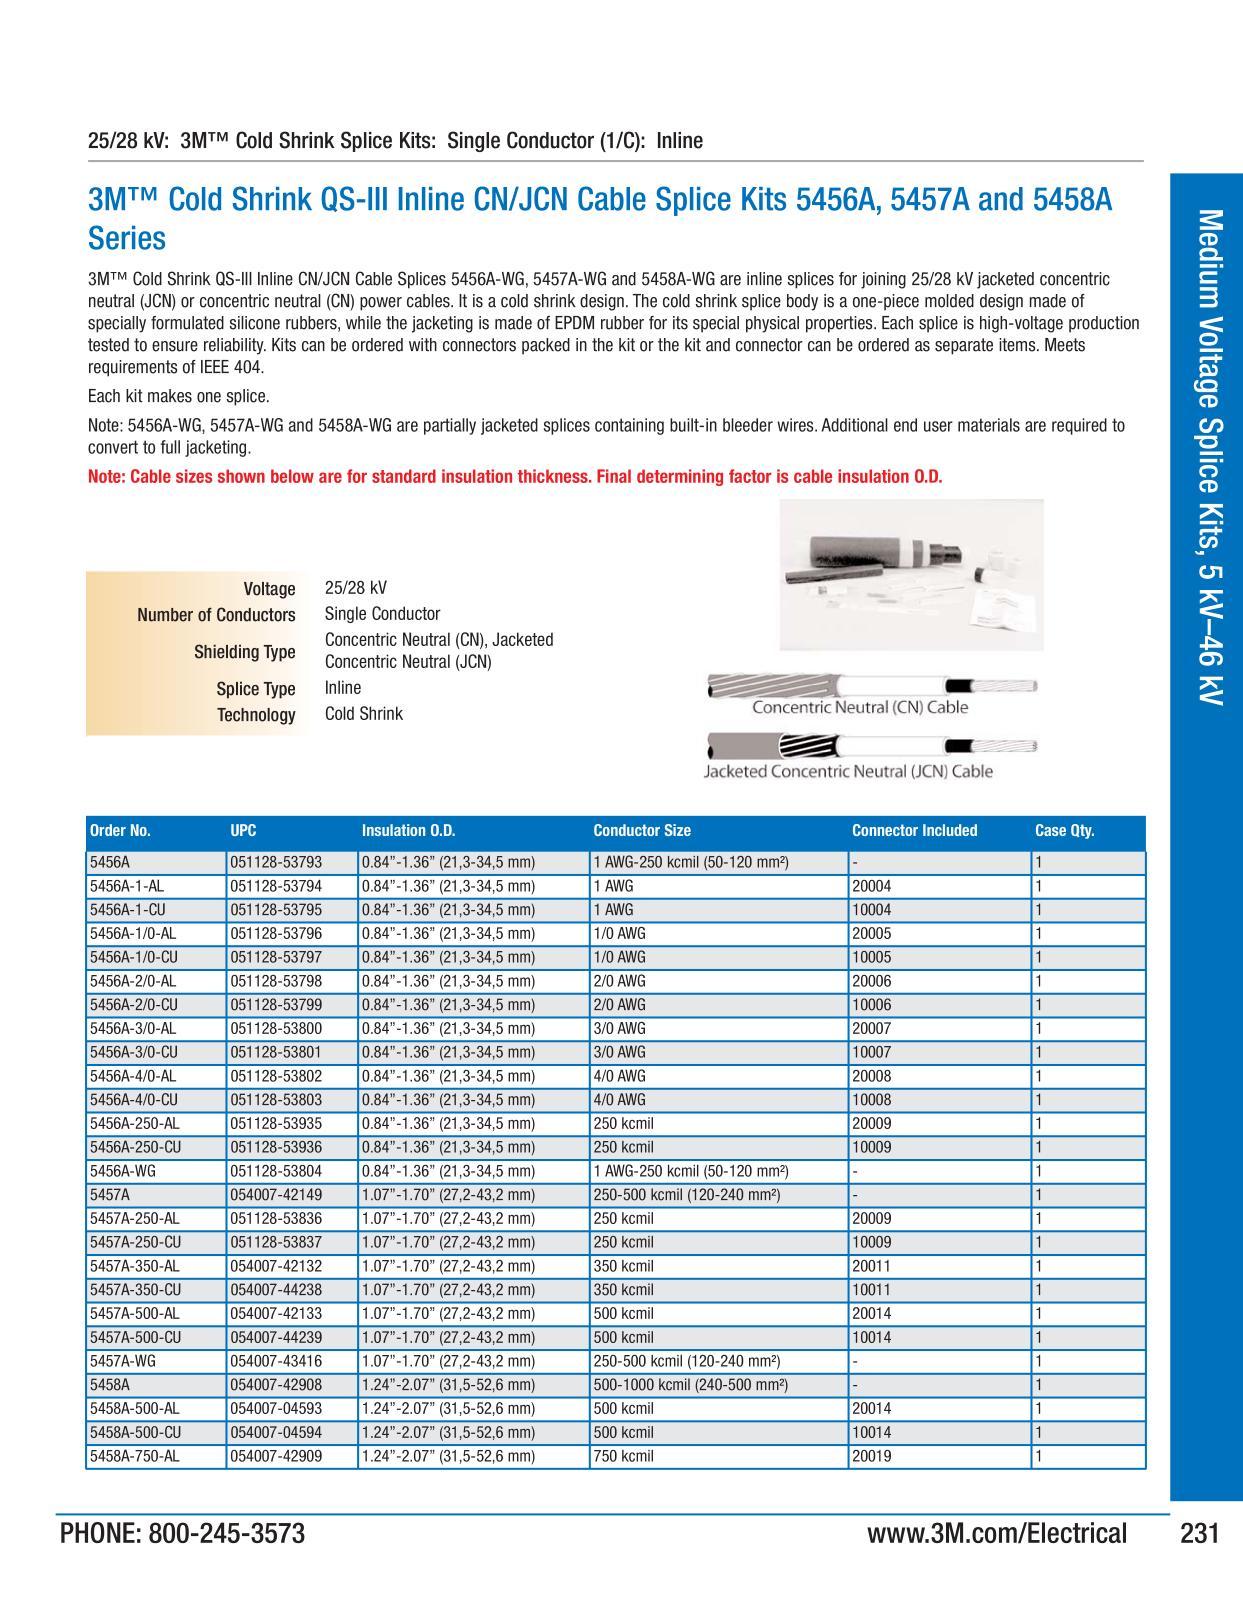 Medium voltage splice kits 5 kv 46 kv 3m big deal promotion page 231 keyboard keysfo Image collections